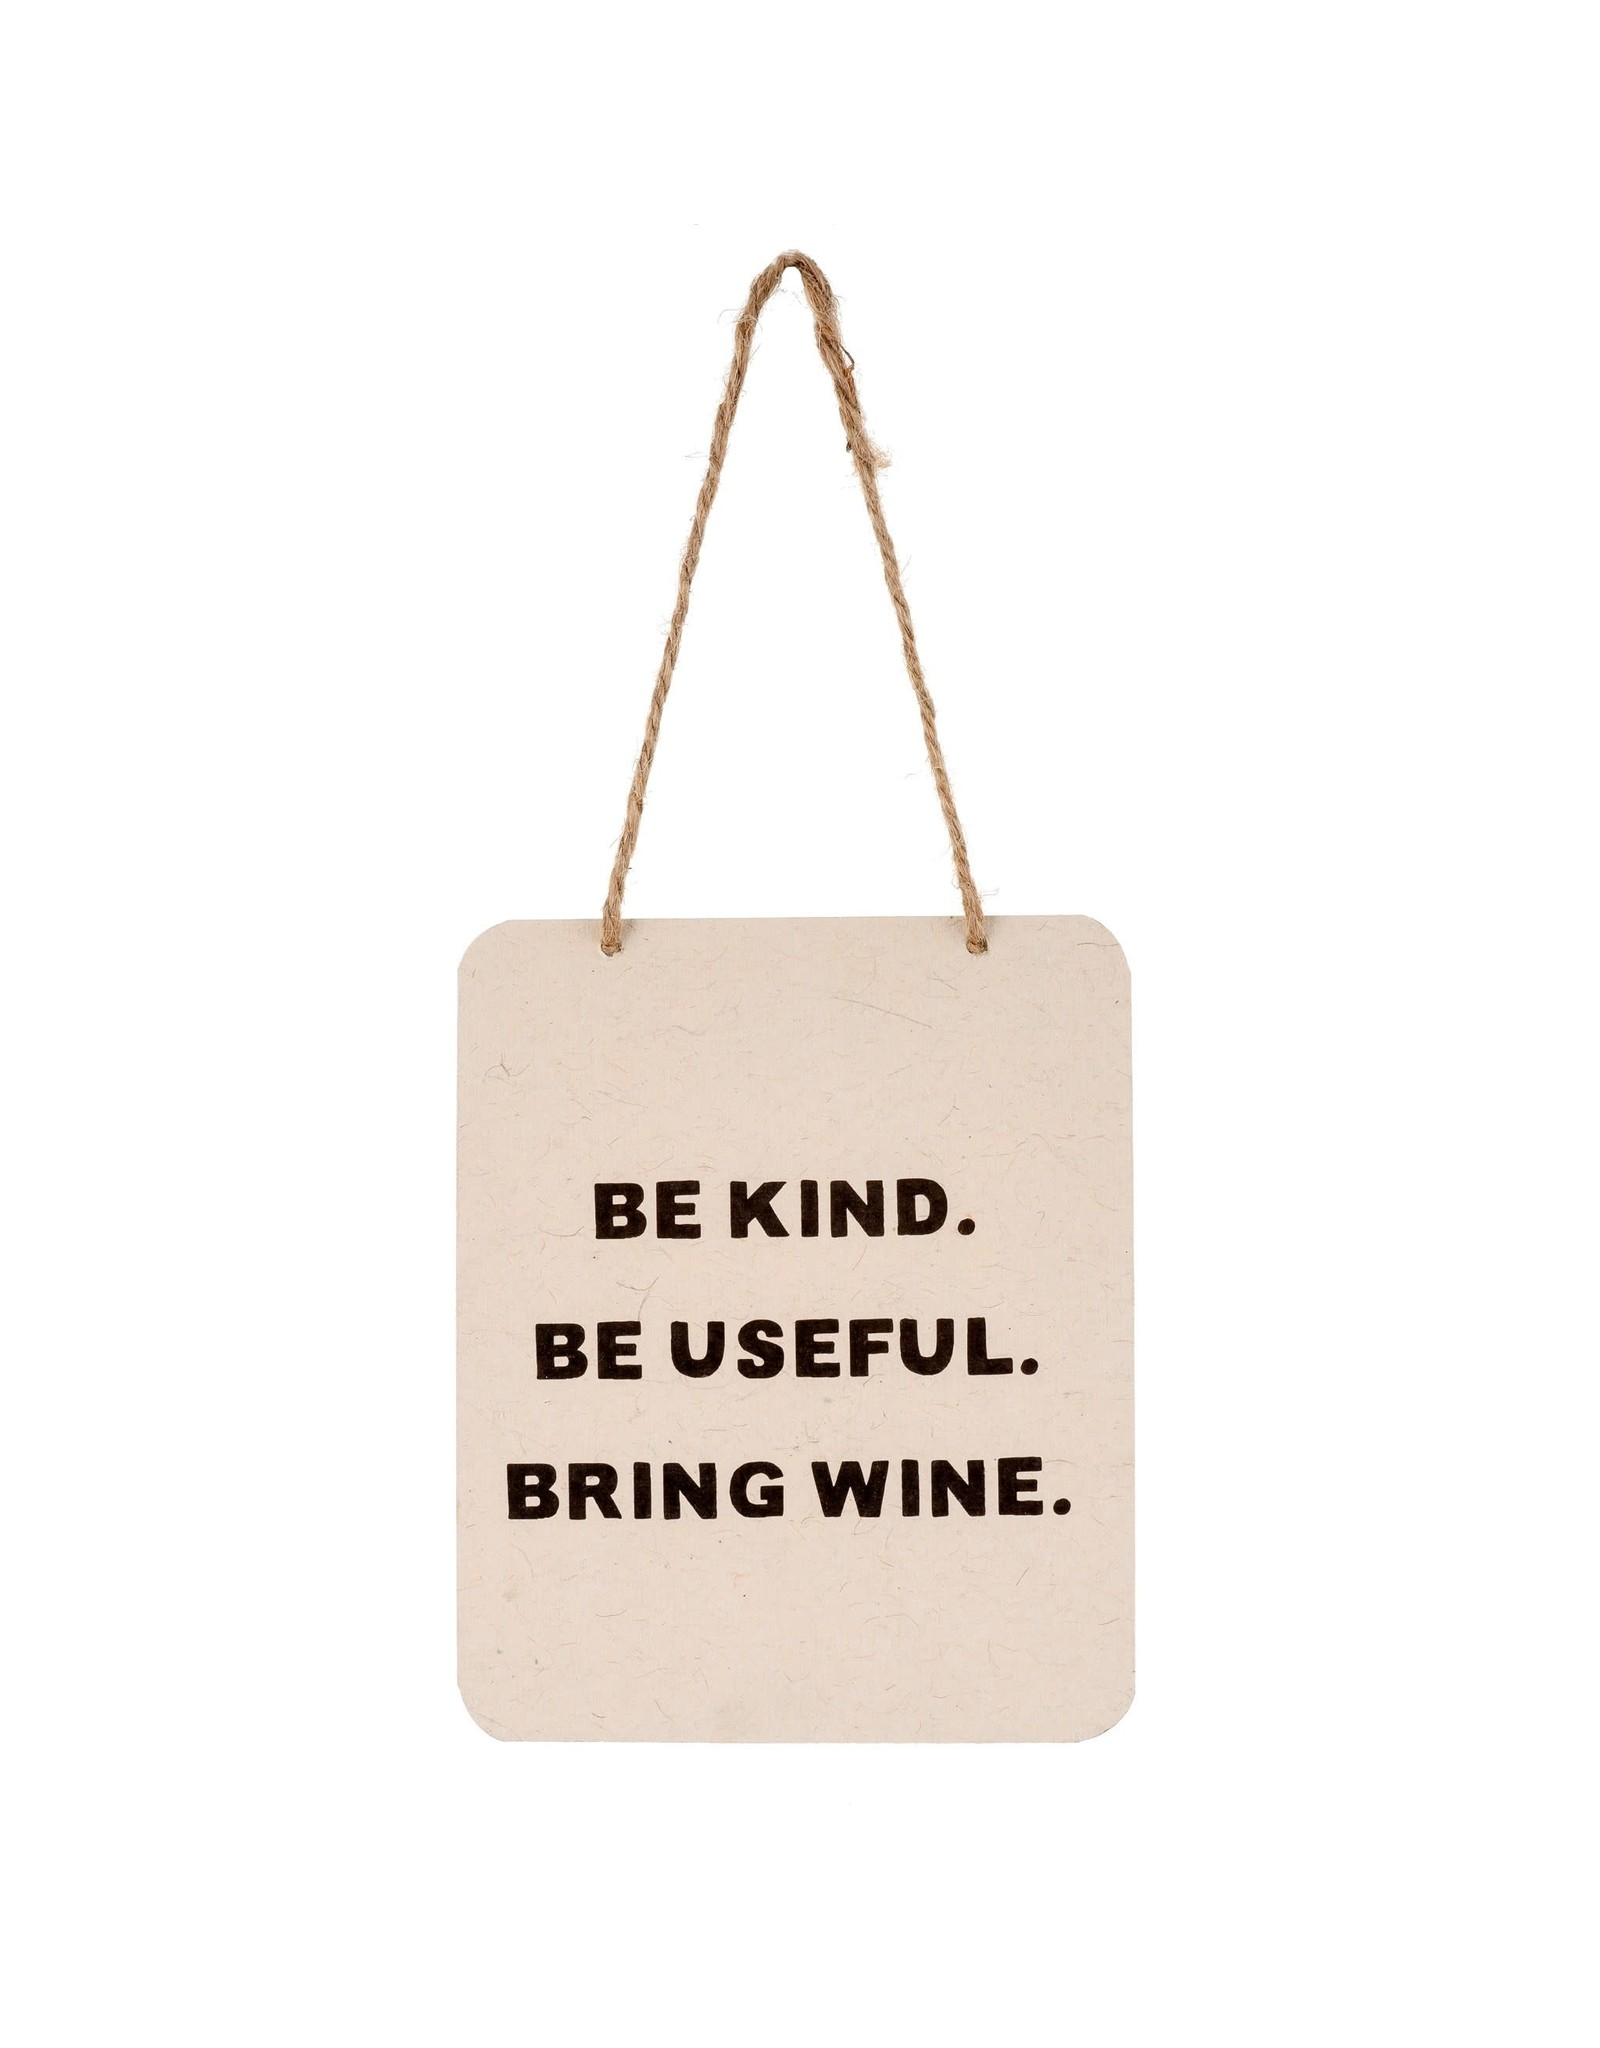 Bring Wine Sign